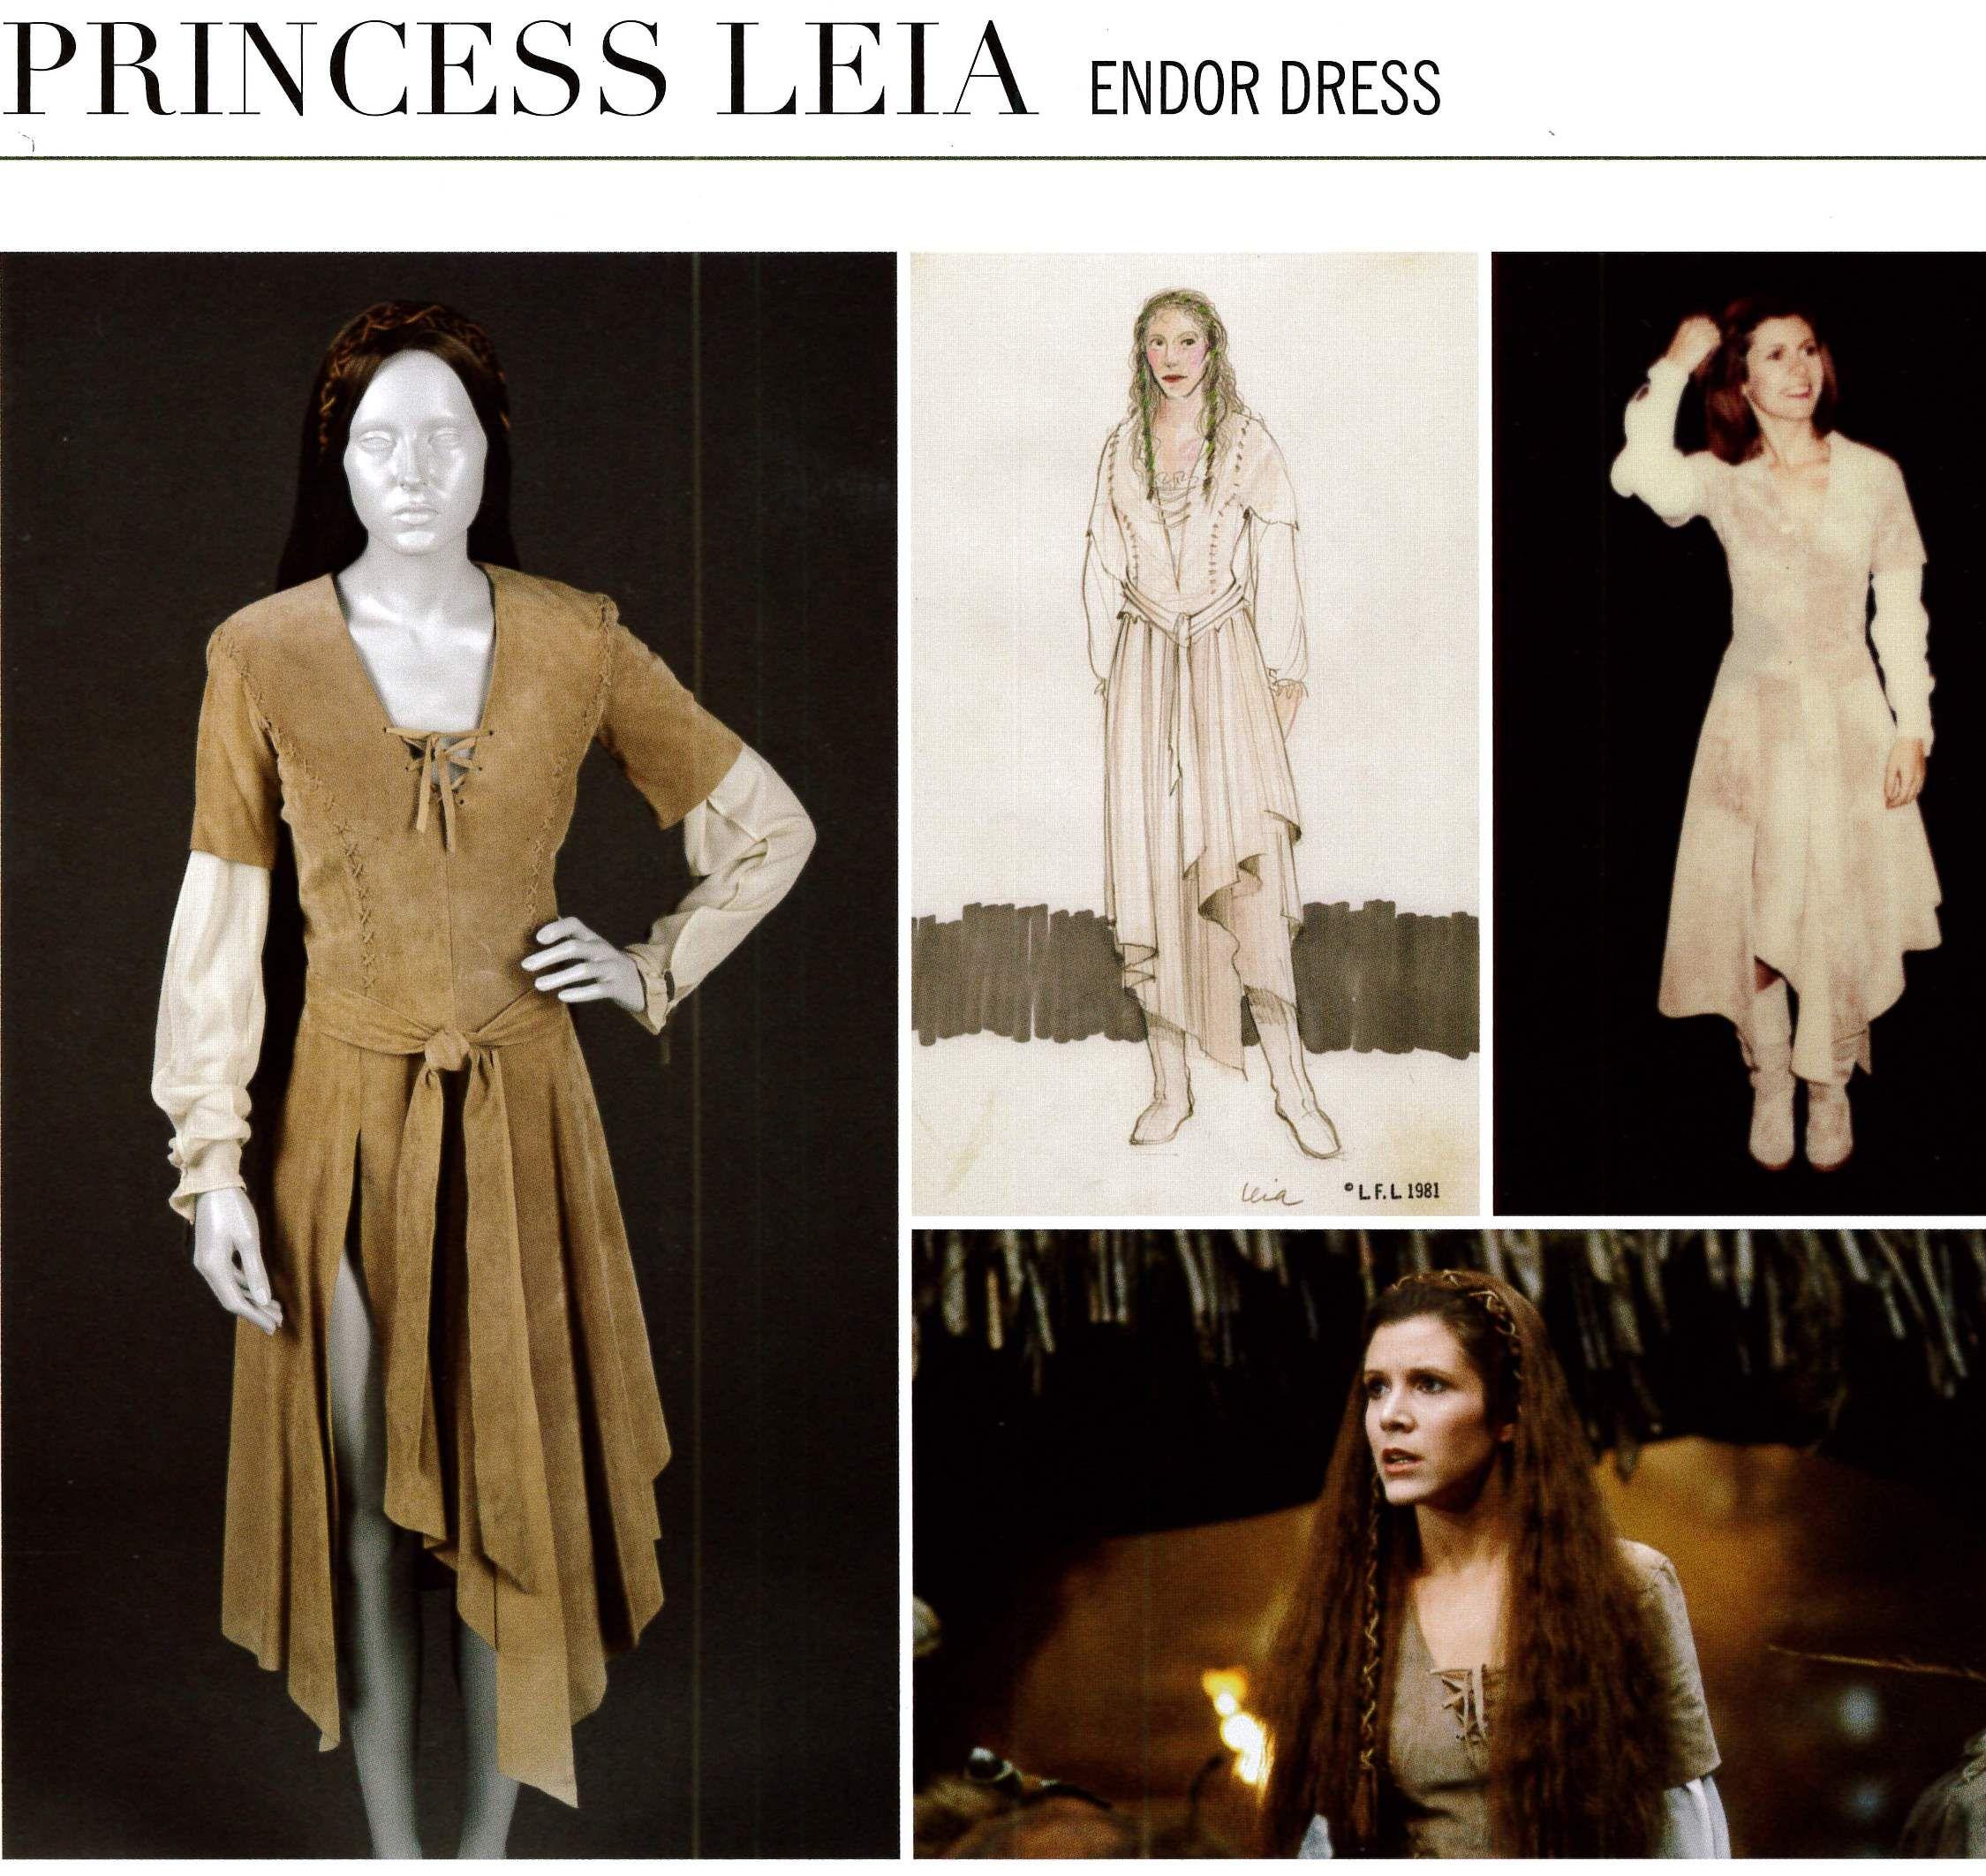 Princess Leia Outfit Endor Book review) star wars costumes  the .  sc 1 st  Pinterest & Princess Leia Outfit Endor Book review) star wars costumes : the ...